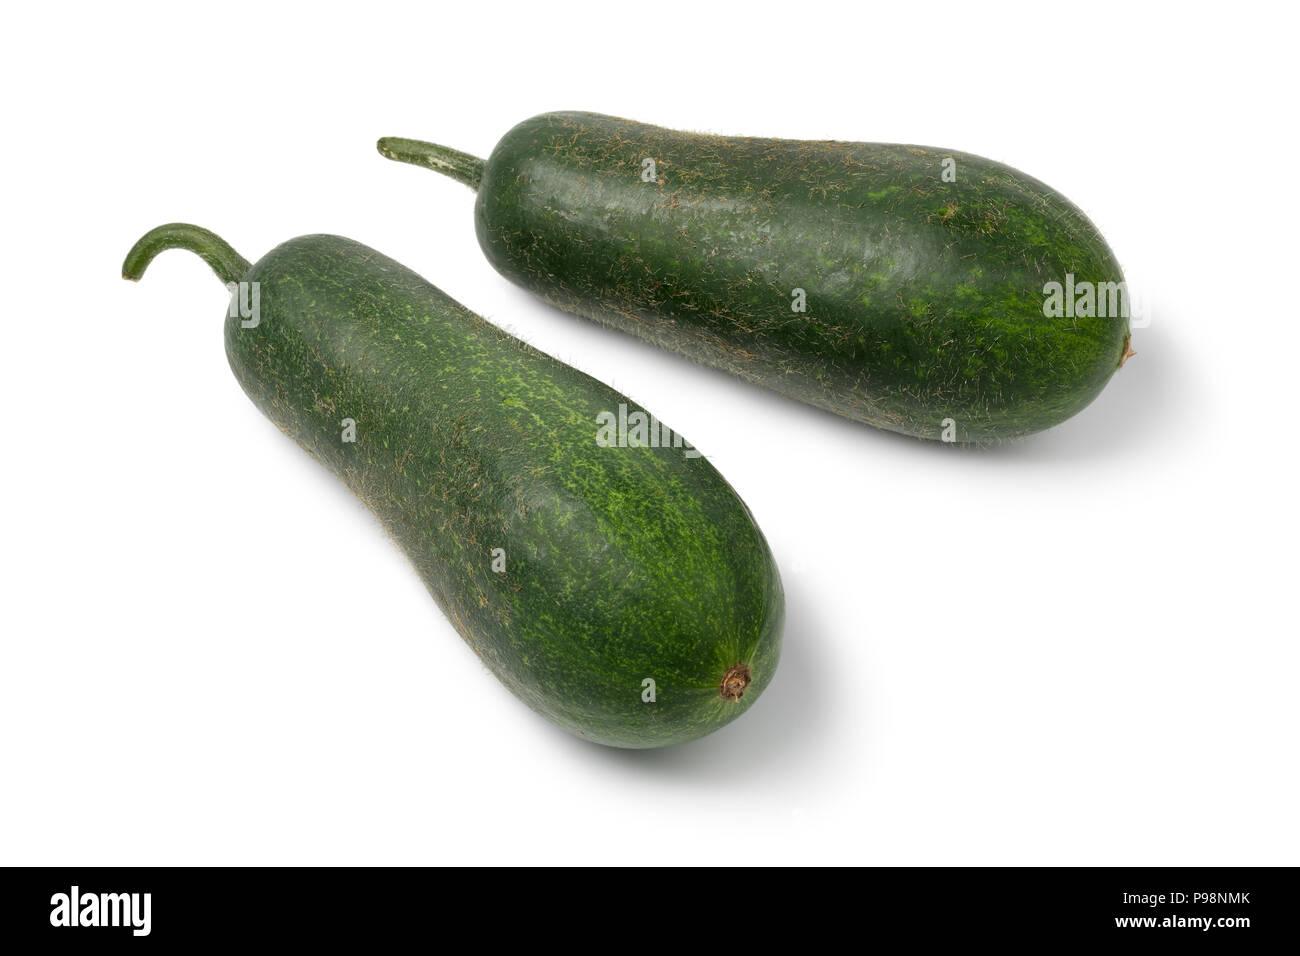 Par de melones fuzzy entera fresca cruda aislado sobre fondo blanco. Imagen De Stock